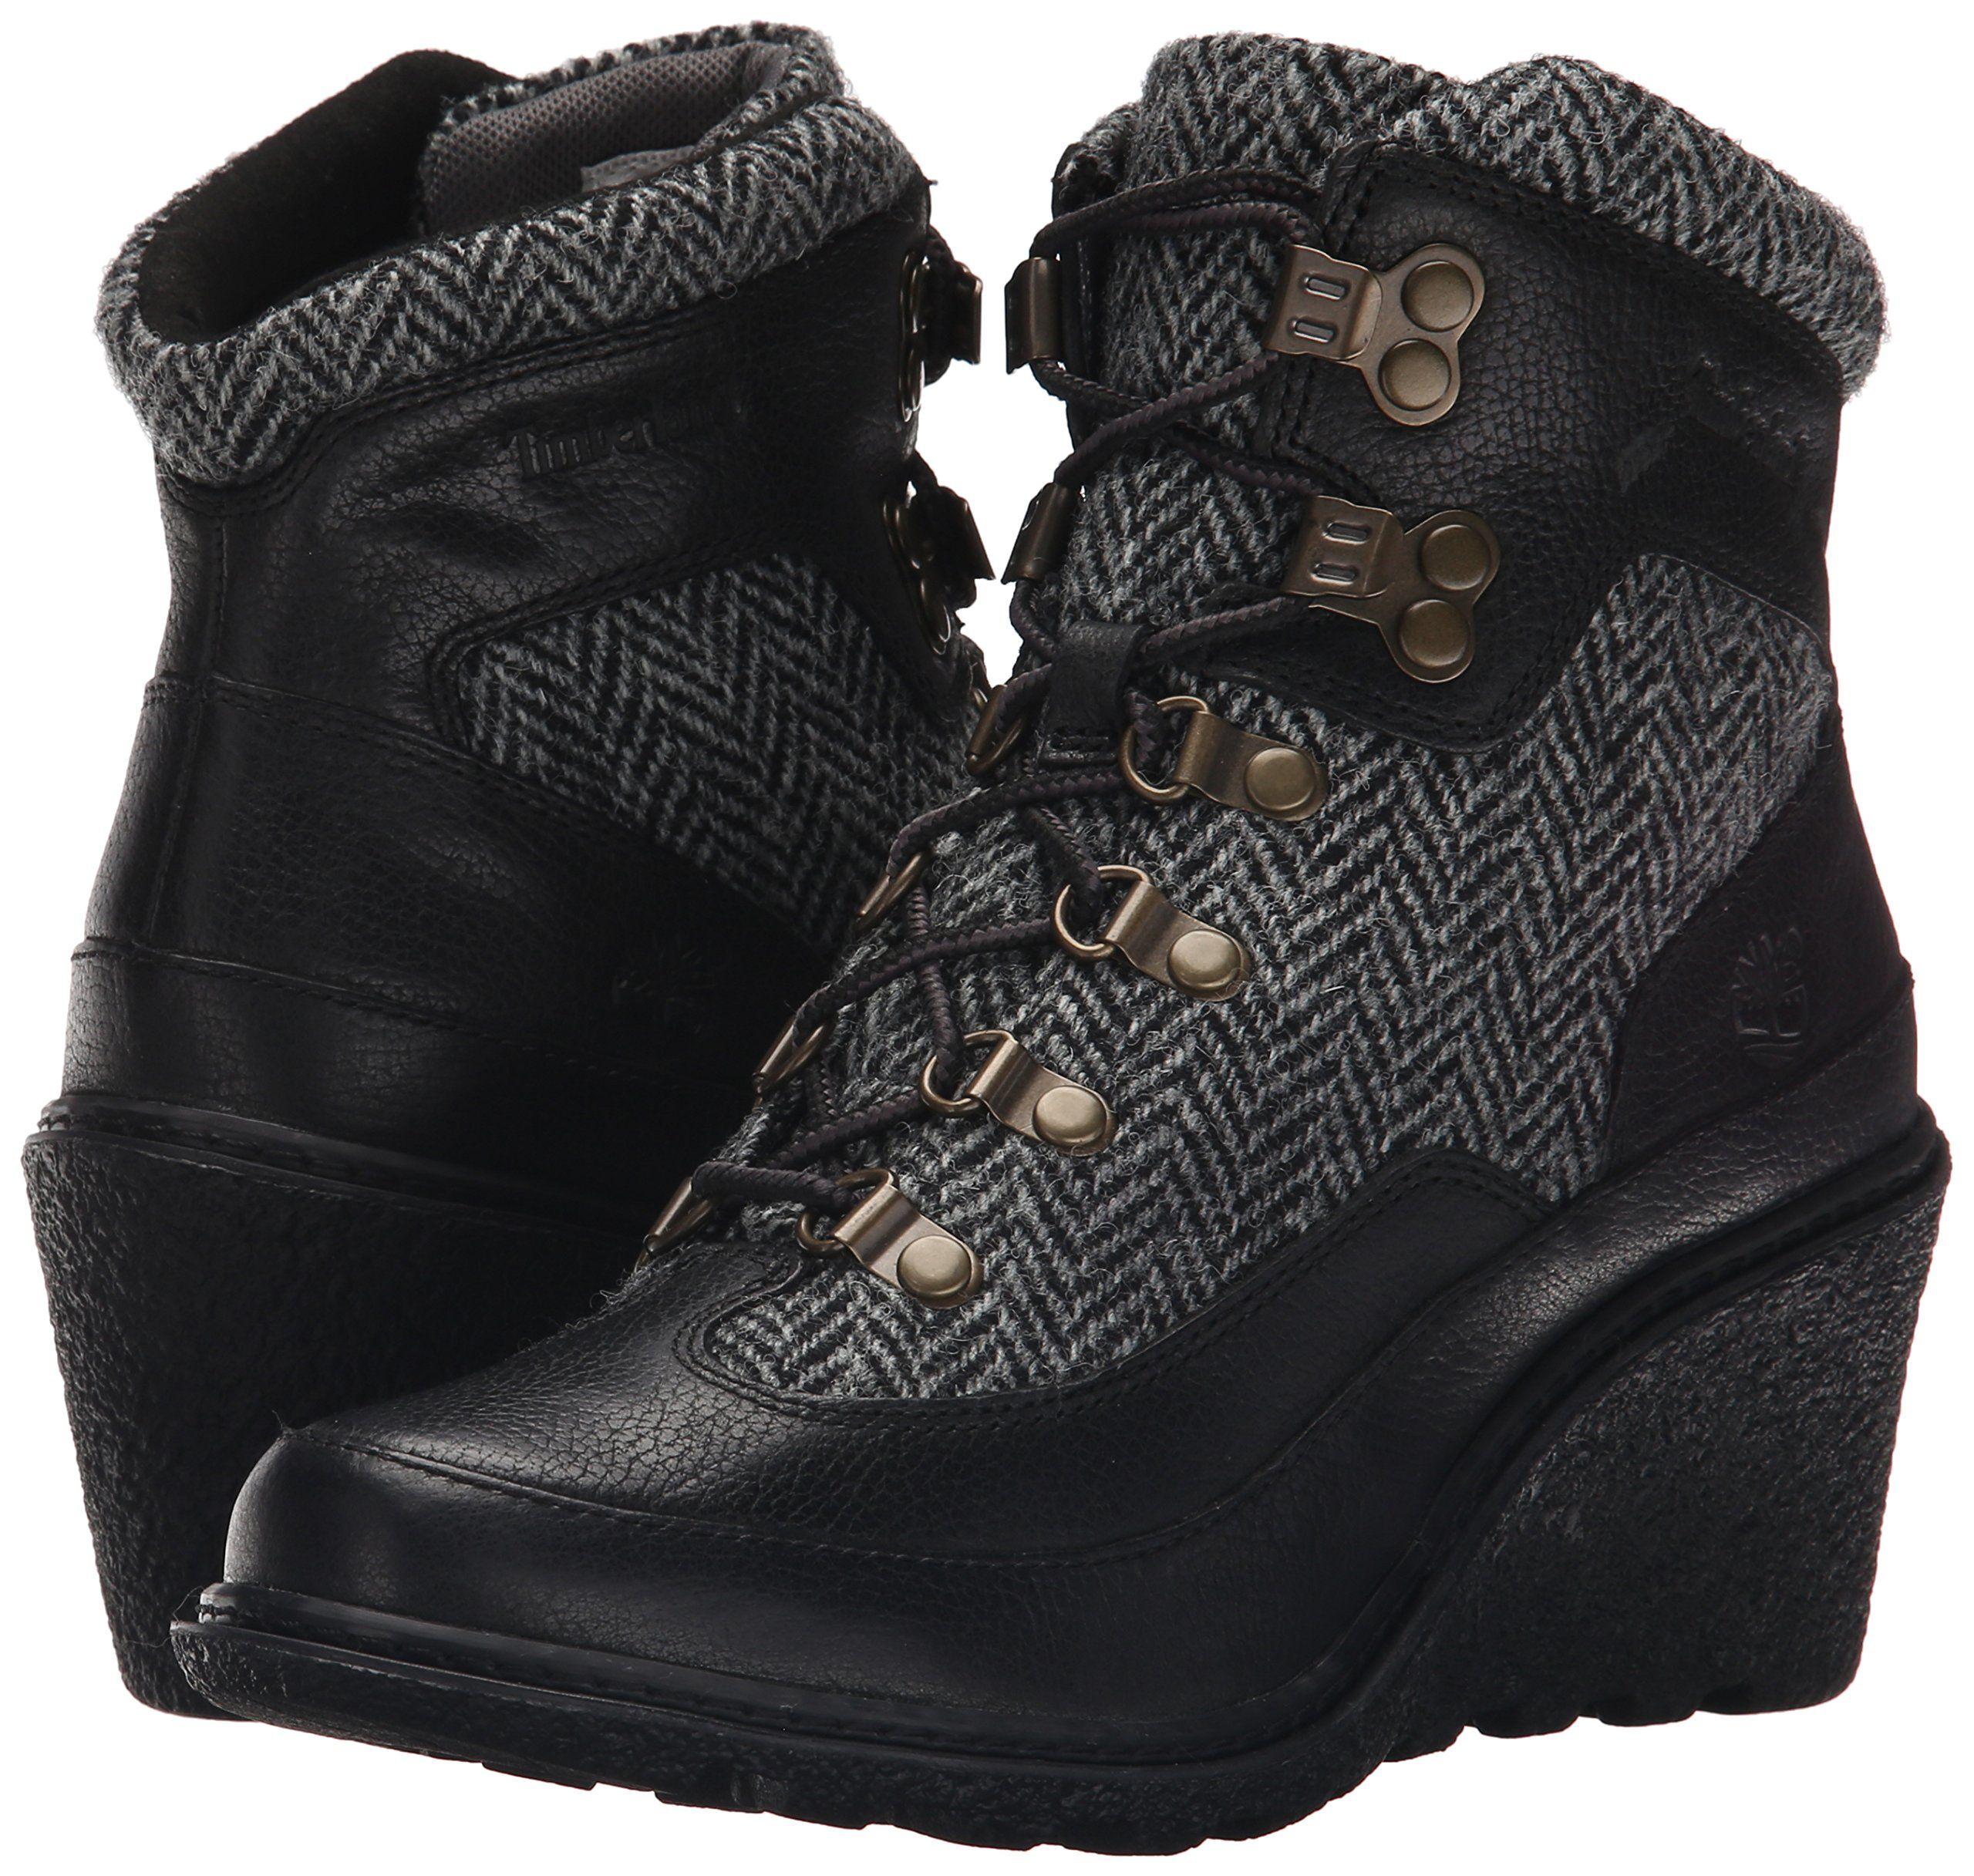 Timberland Womens Amston Hiker Boot Jet Black Woodlands/Grey Harris Tweed  Wool 8.5 M US